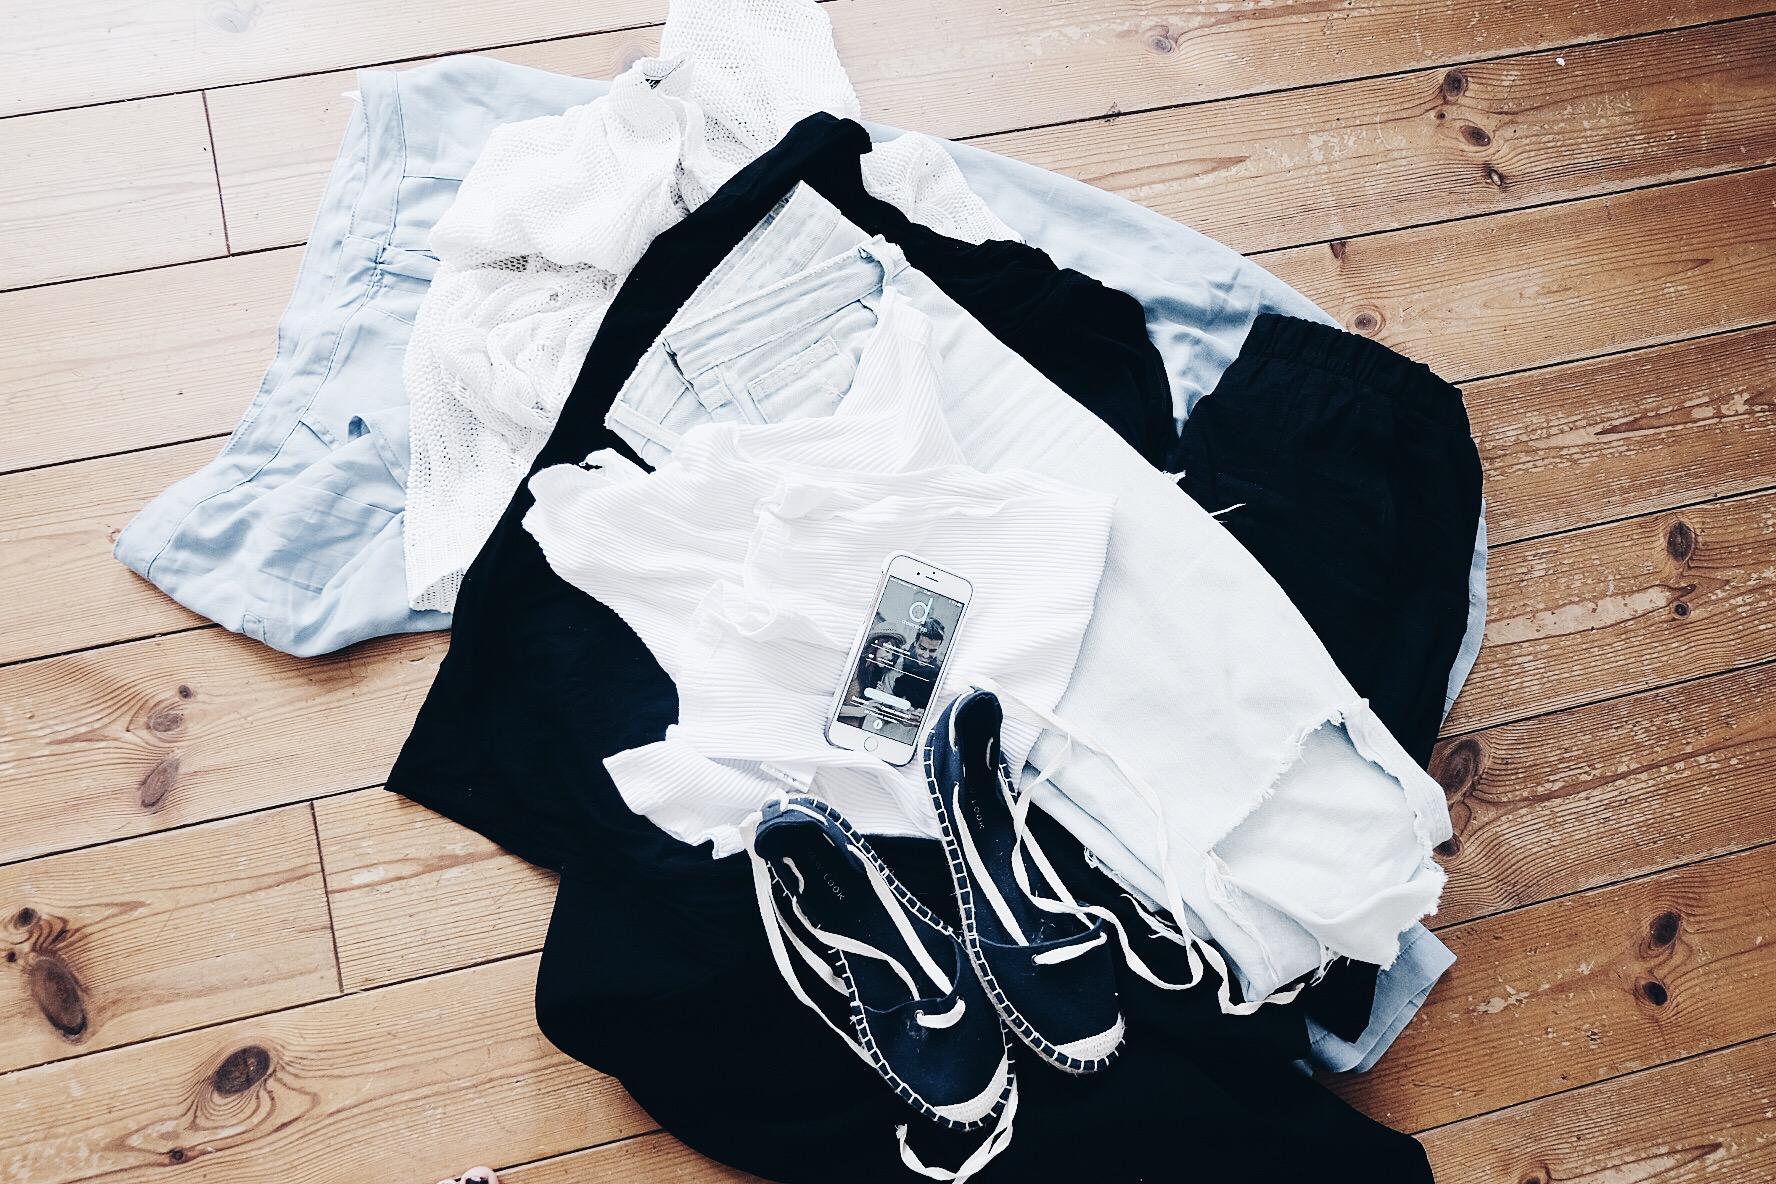 dress me app, blogger, Kleidung, Stillife, Espadrilles, Jeans, Minimalism